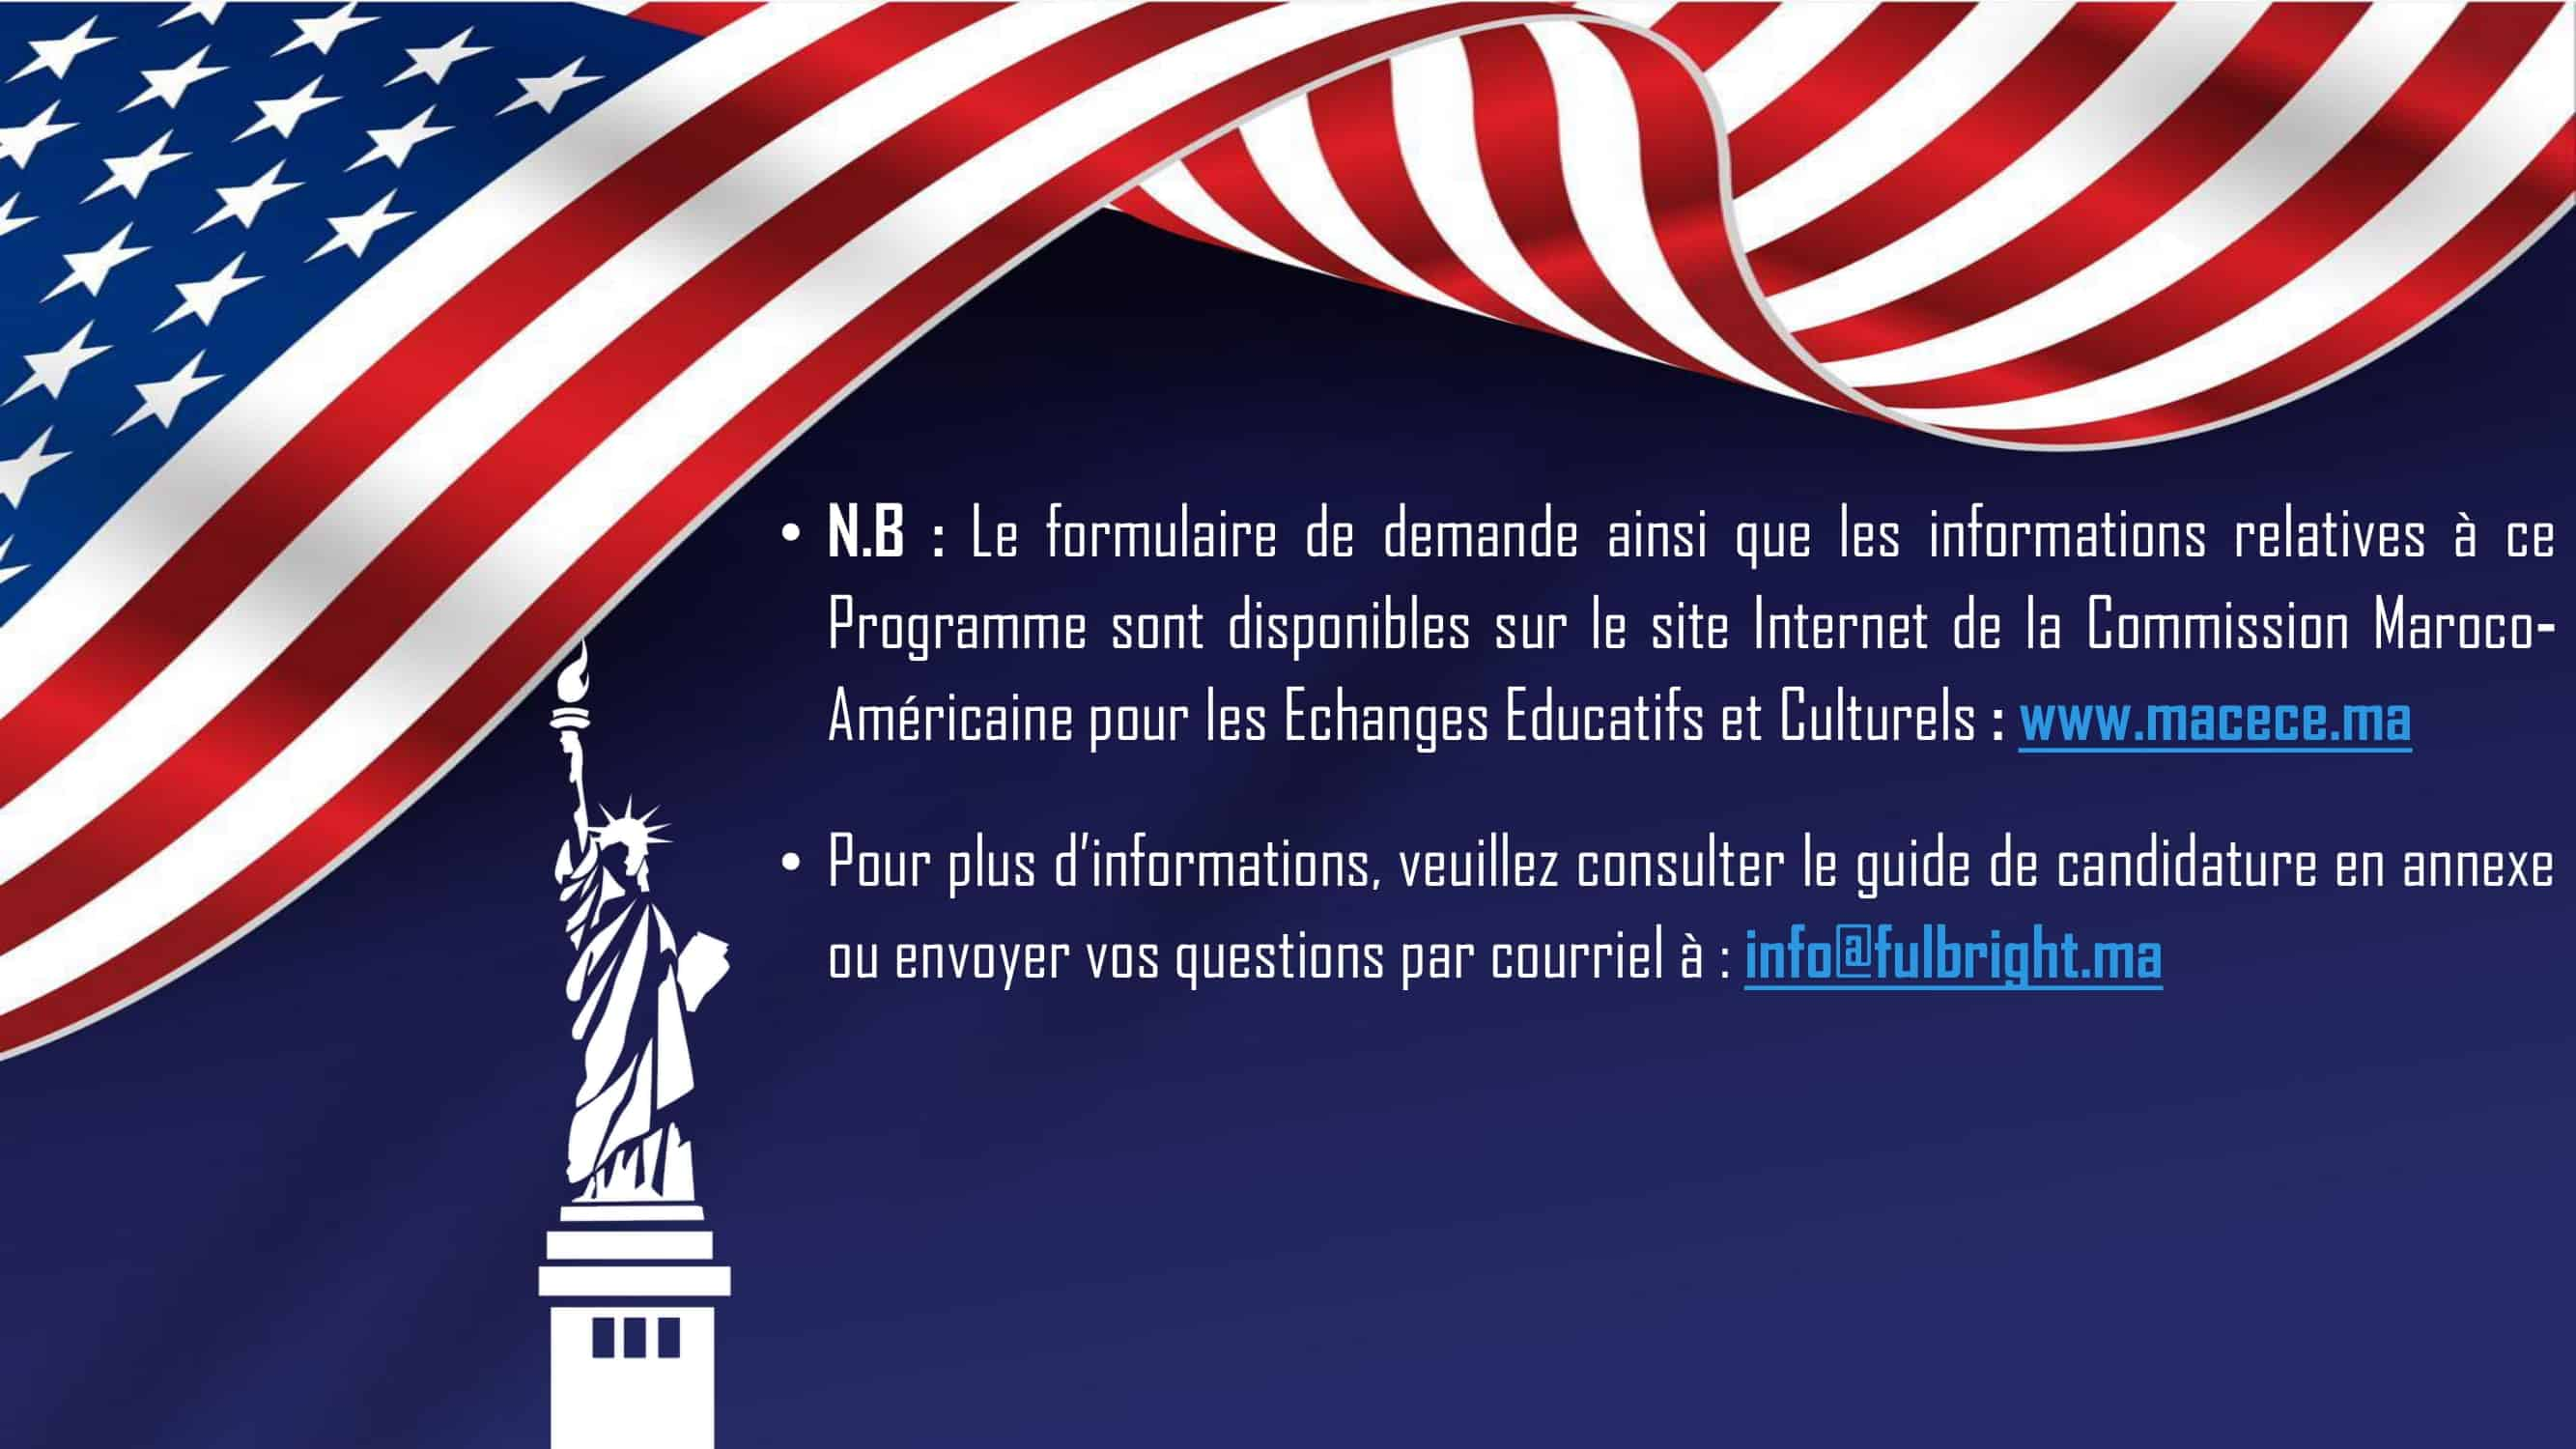 Doctorat Fulbright 3 Bourses Fullbright Program aux Etats-Unis 2022/2023